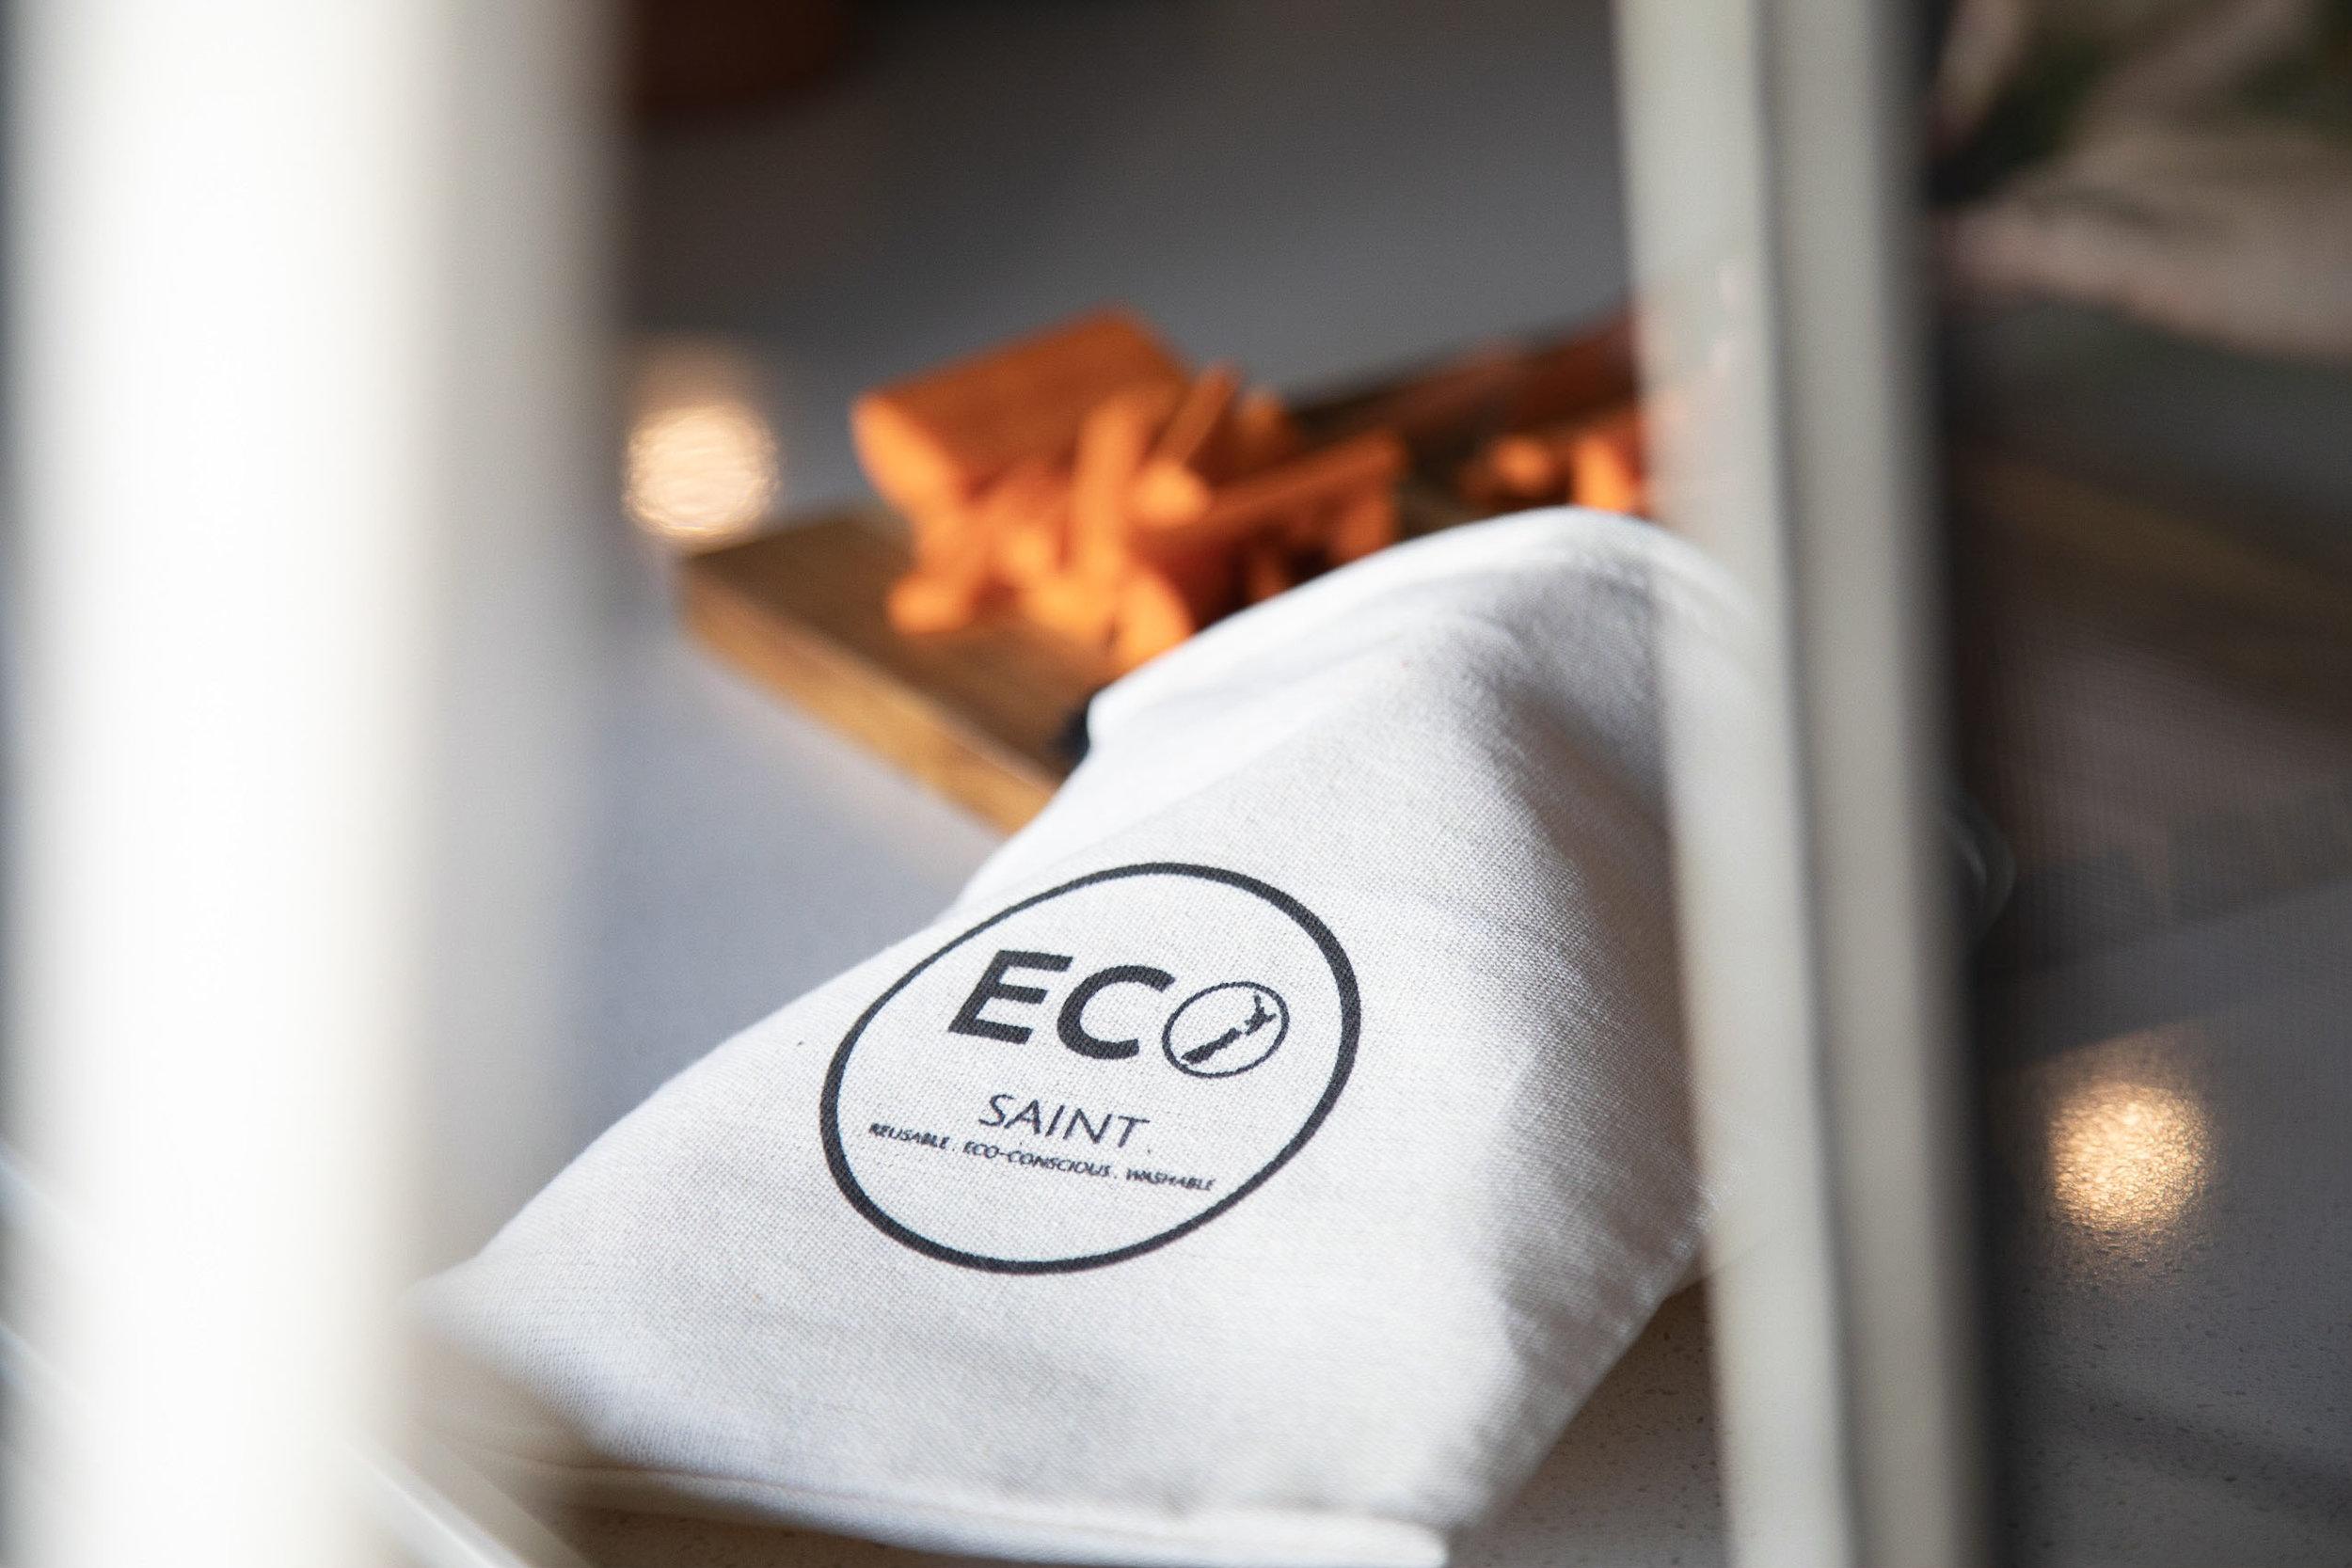 Eco Saint_1.jpg